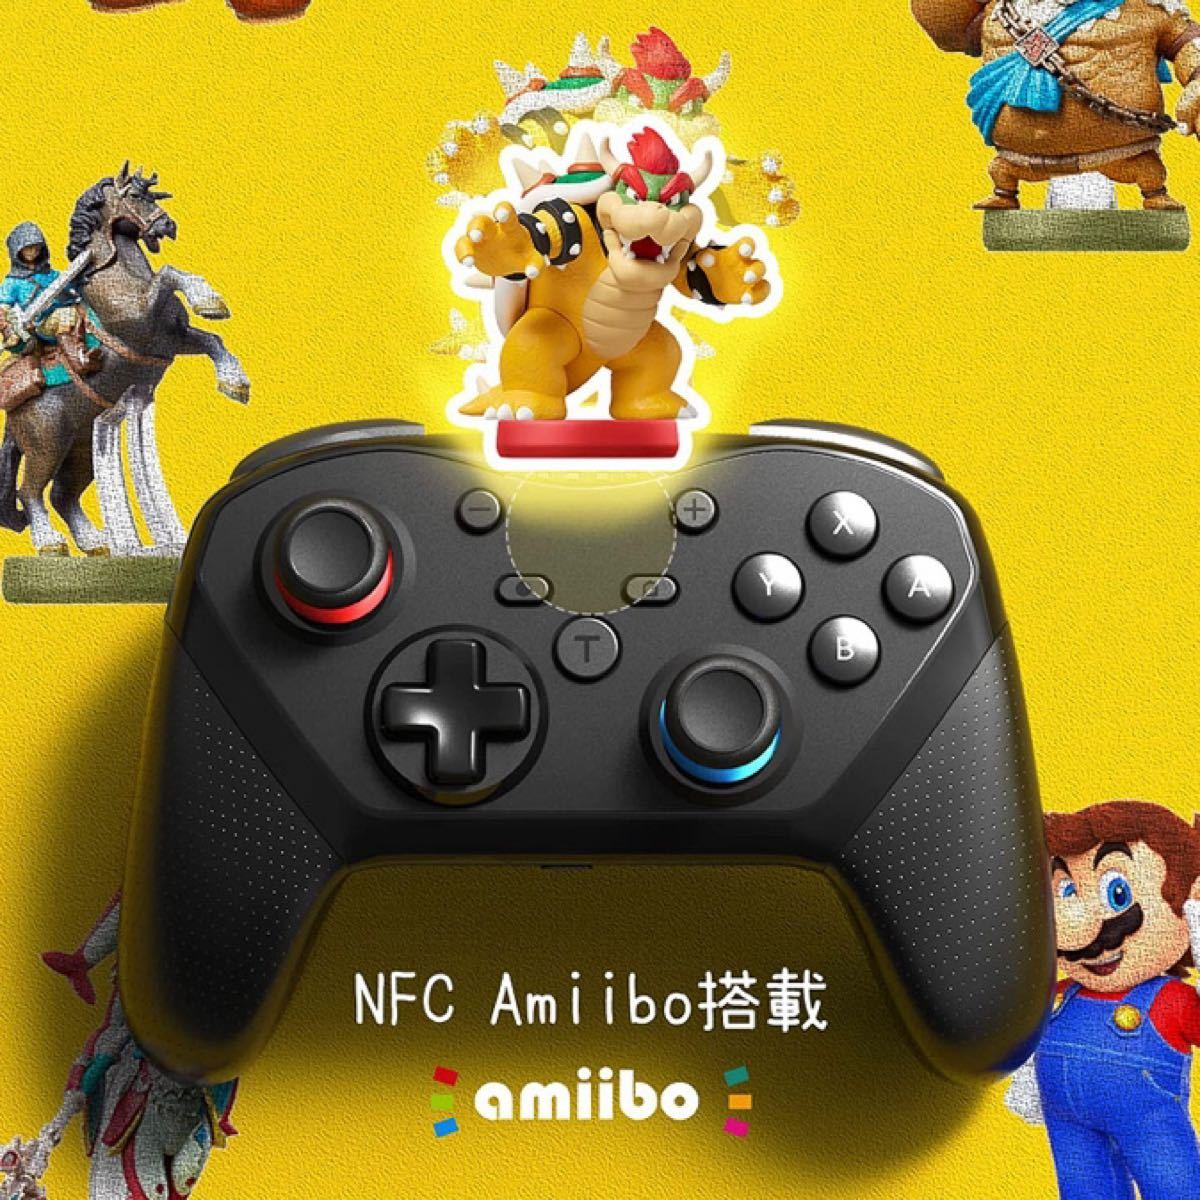 Switch スイッチ コントローラー 無線 ワイヤレス 連射 スイッチ 振動 Bluetooth Nintendo Switch